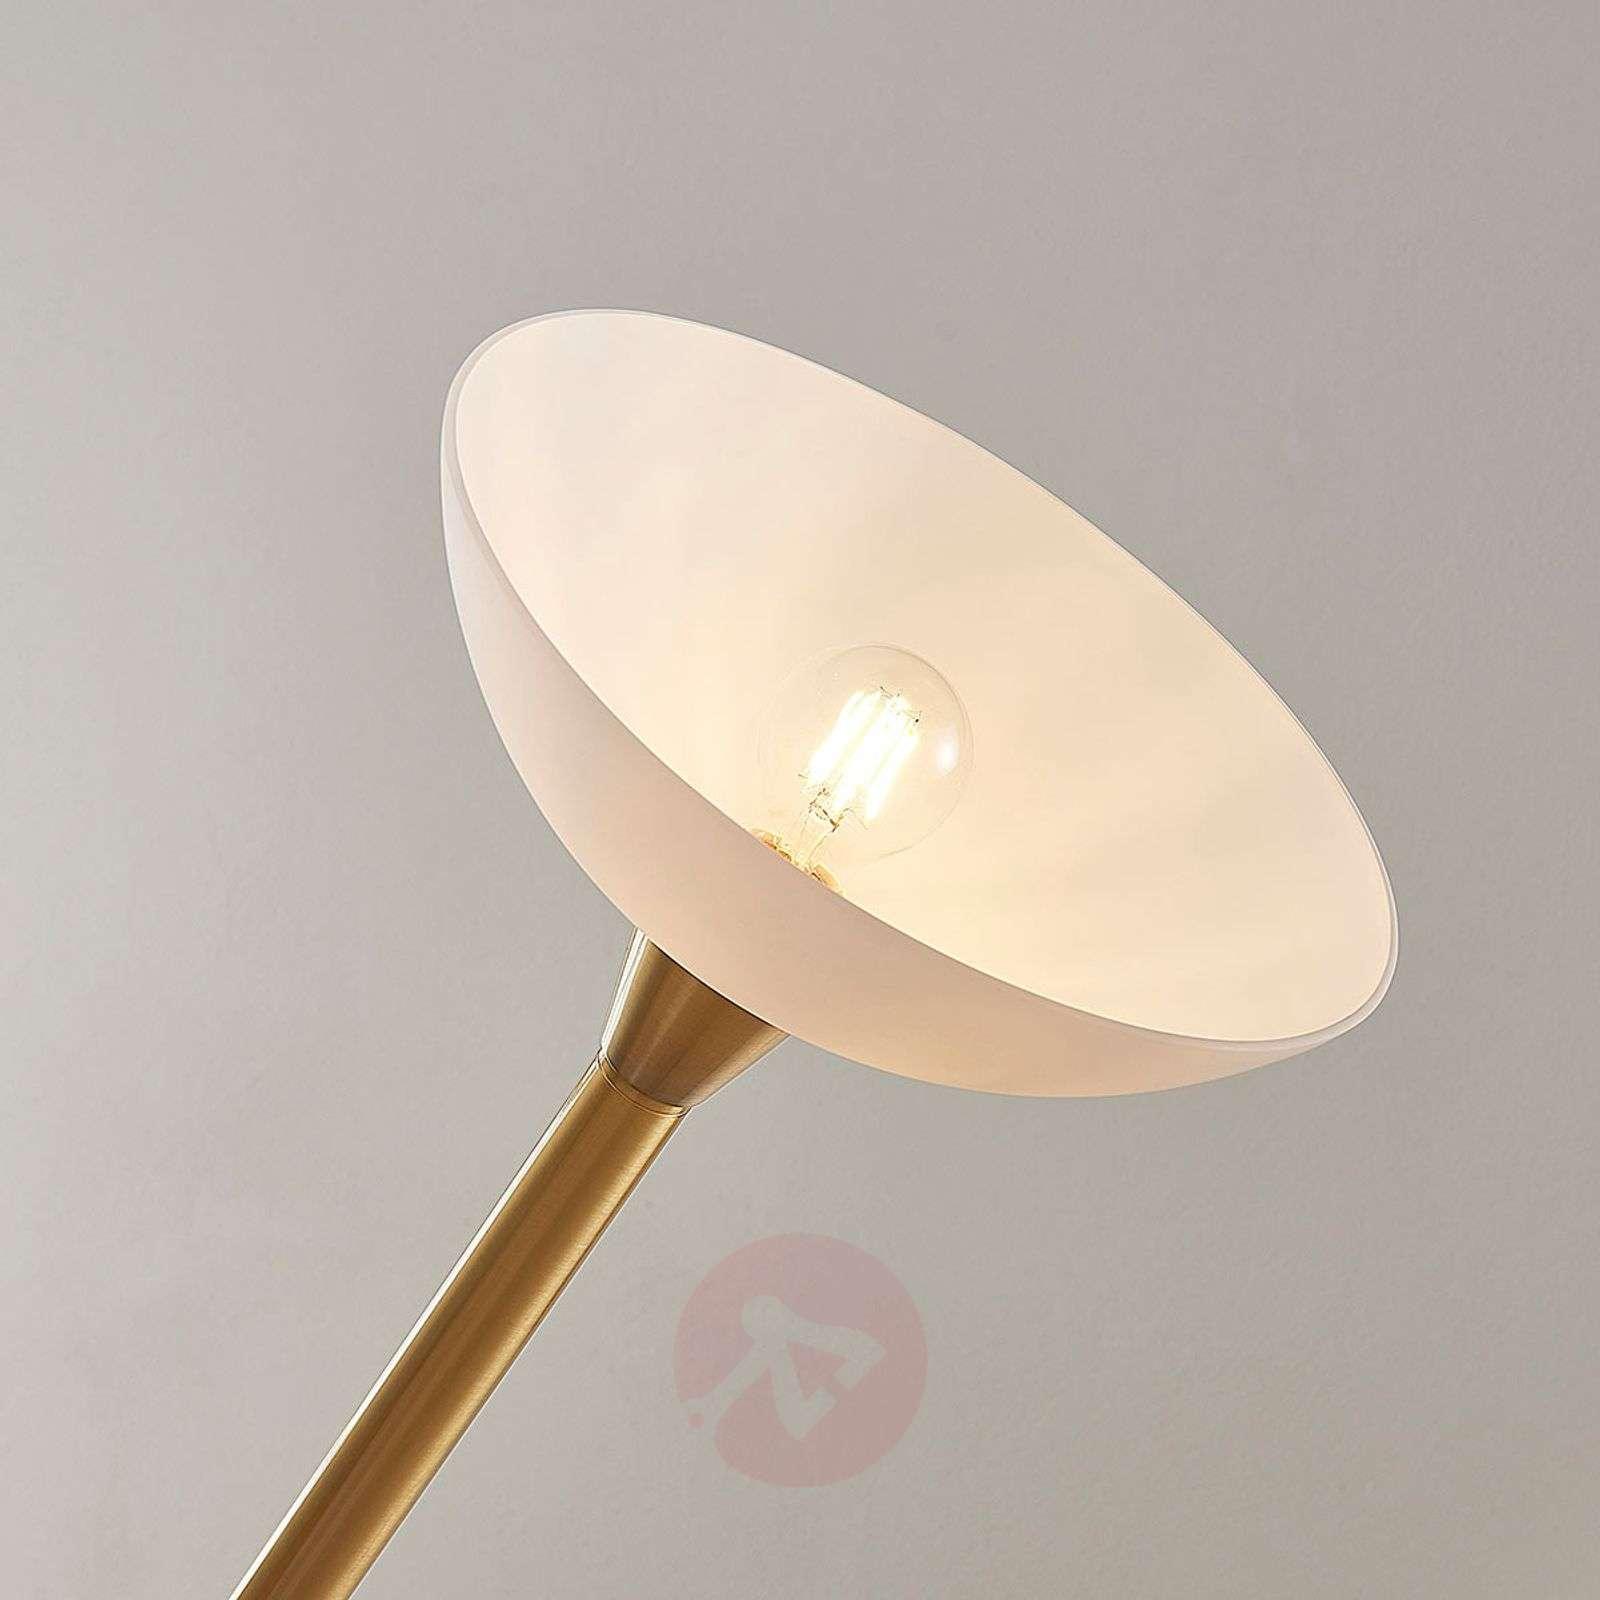 Brass-coloured uplighter Ignacia-9621679-02